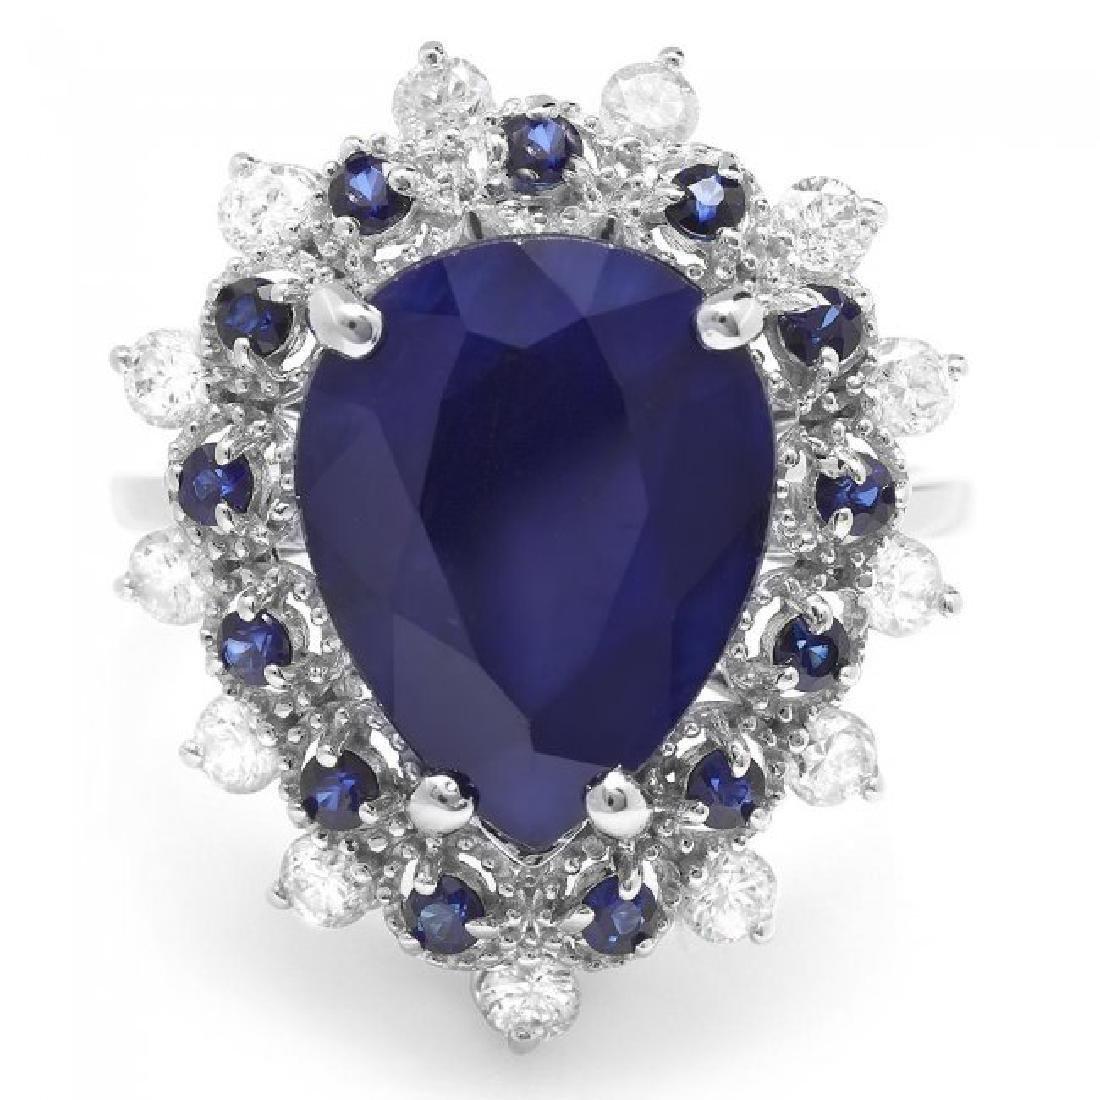 14k Gold 5.55ct Sapphire 0.55ct Diamond Ring - 2